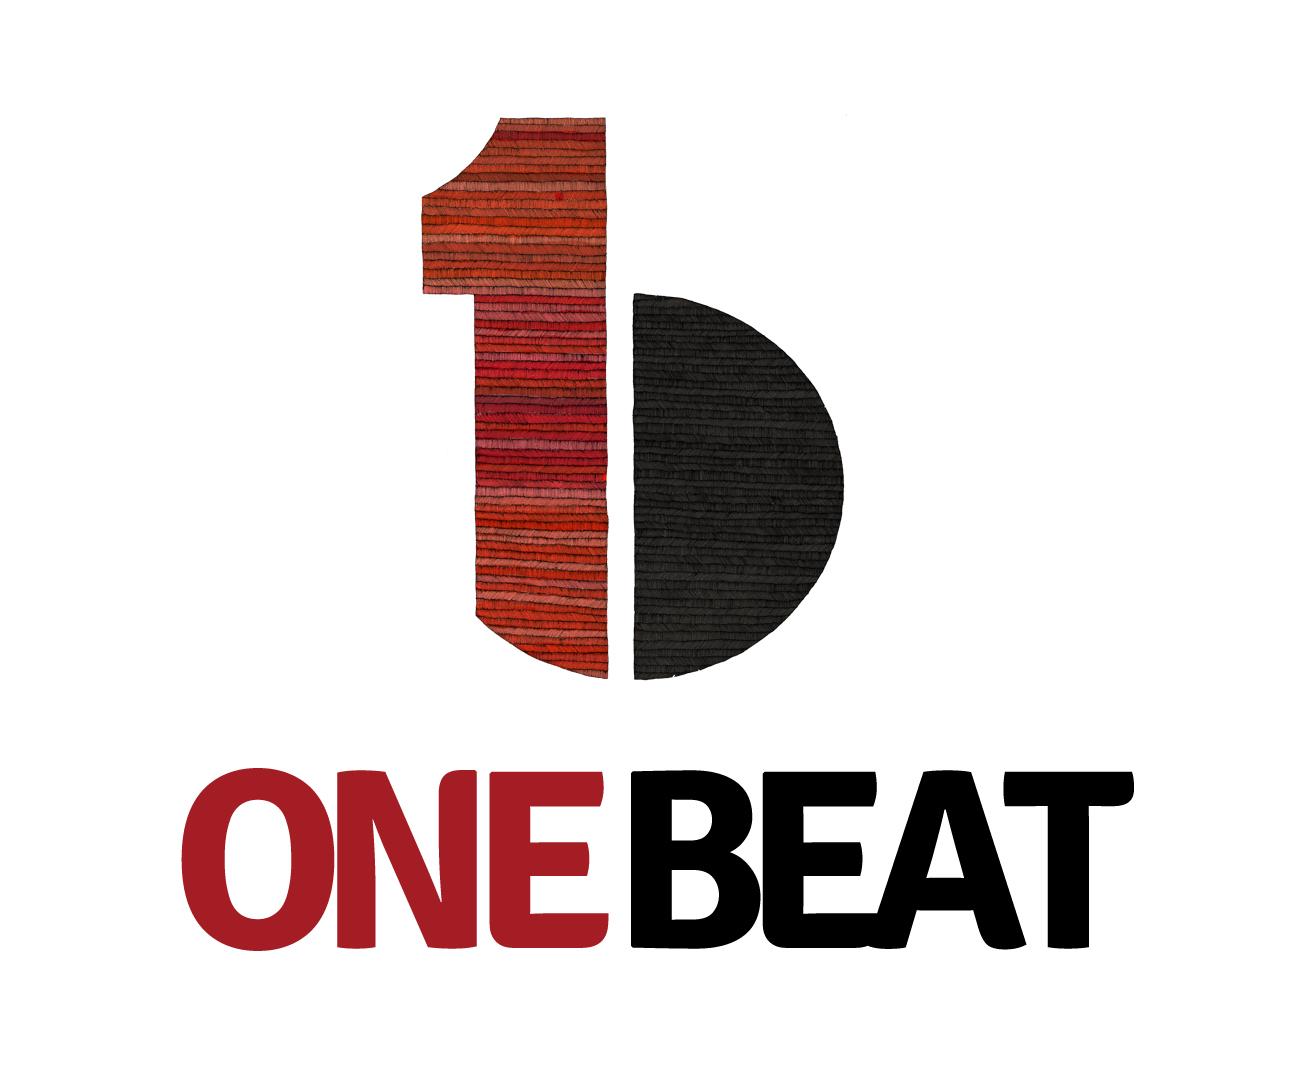 OneBeat_LOGO_hannah1.jpg